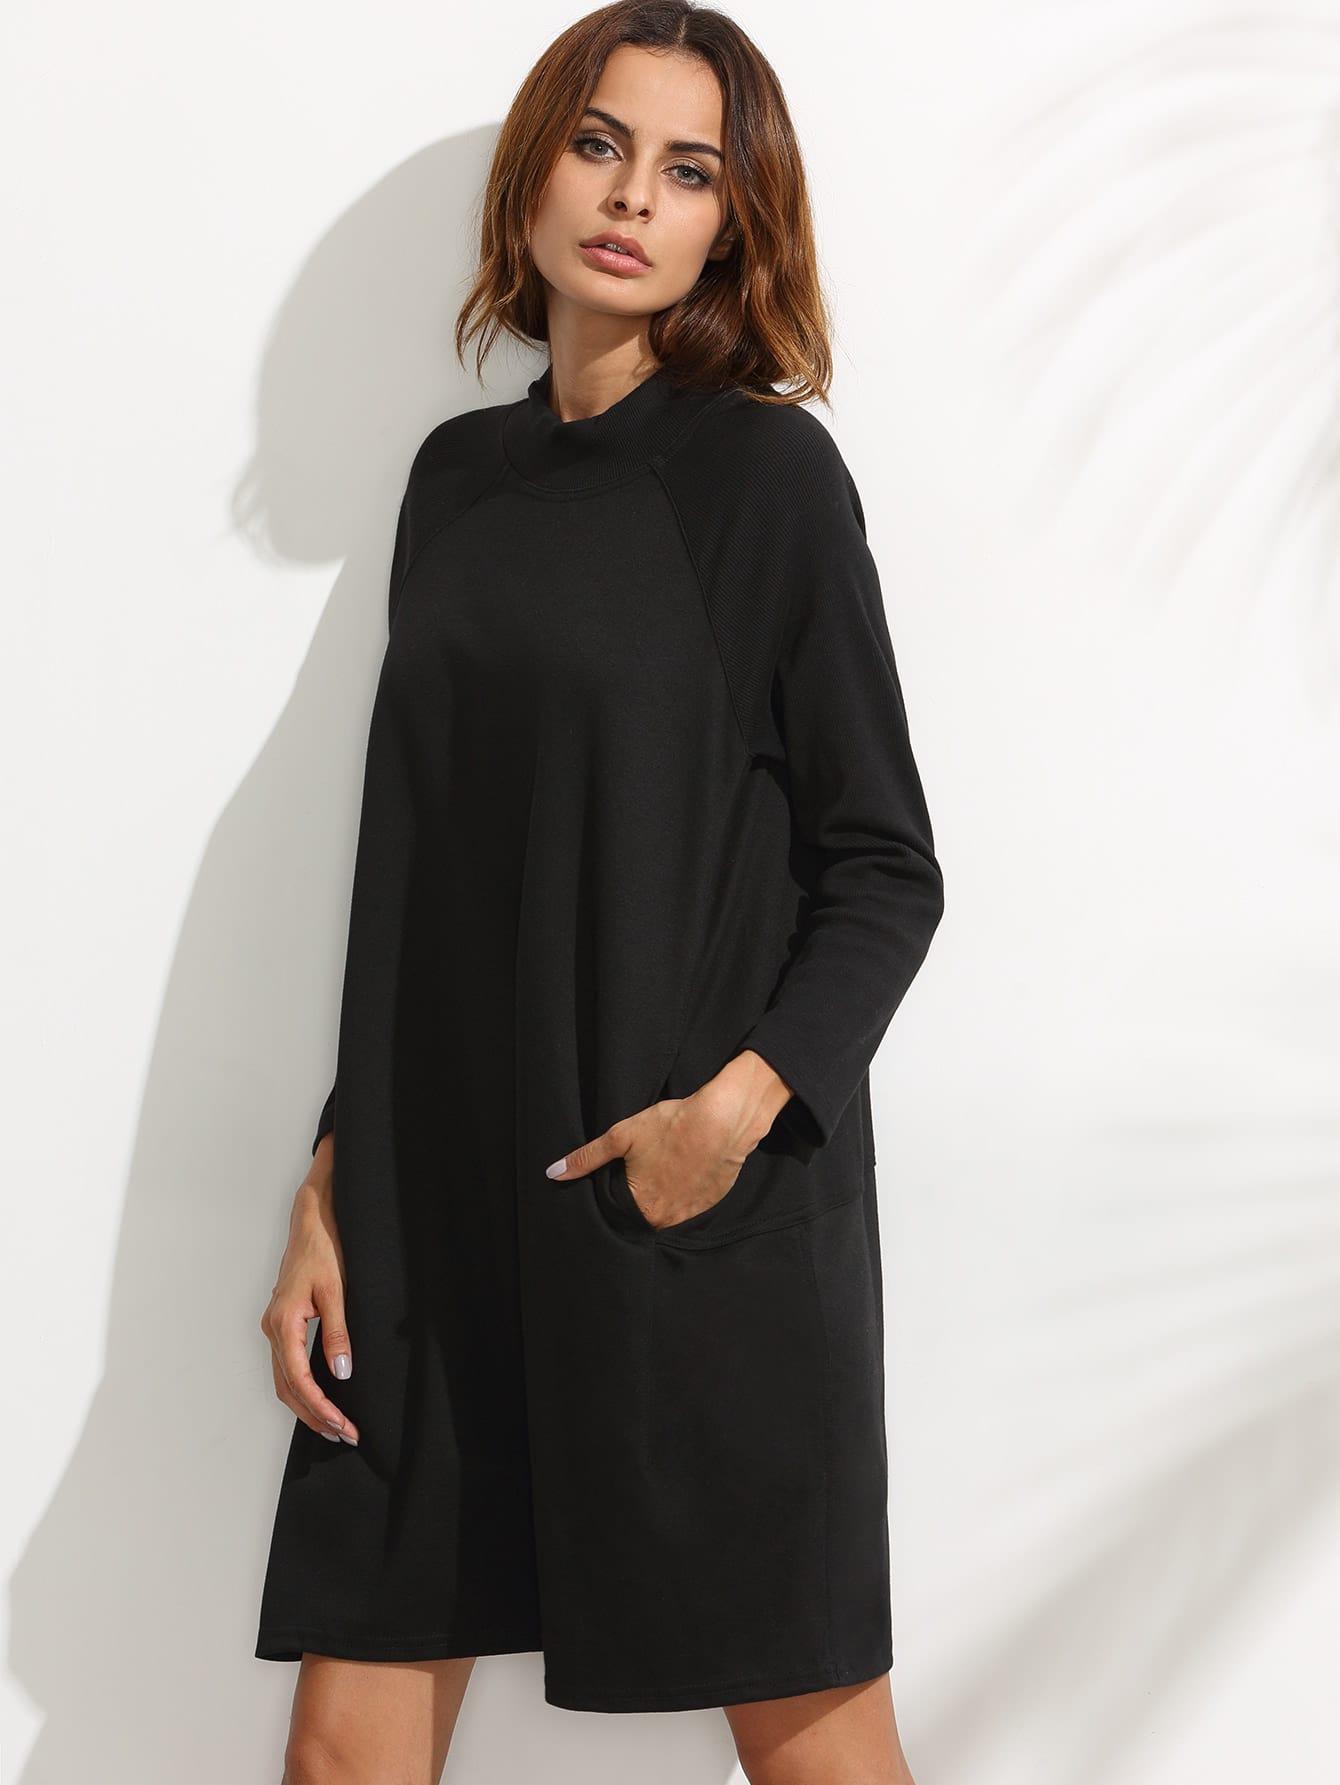 Black Ribbed Raglan Sleeve Sweatshirt Dress dress160708113